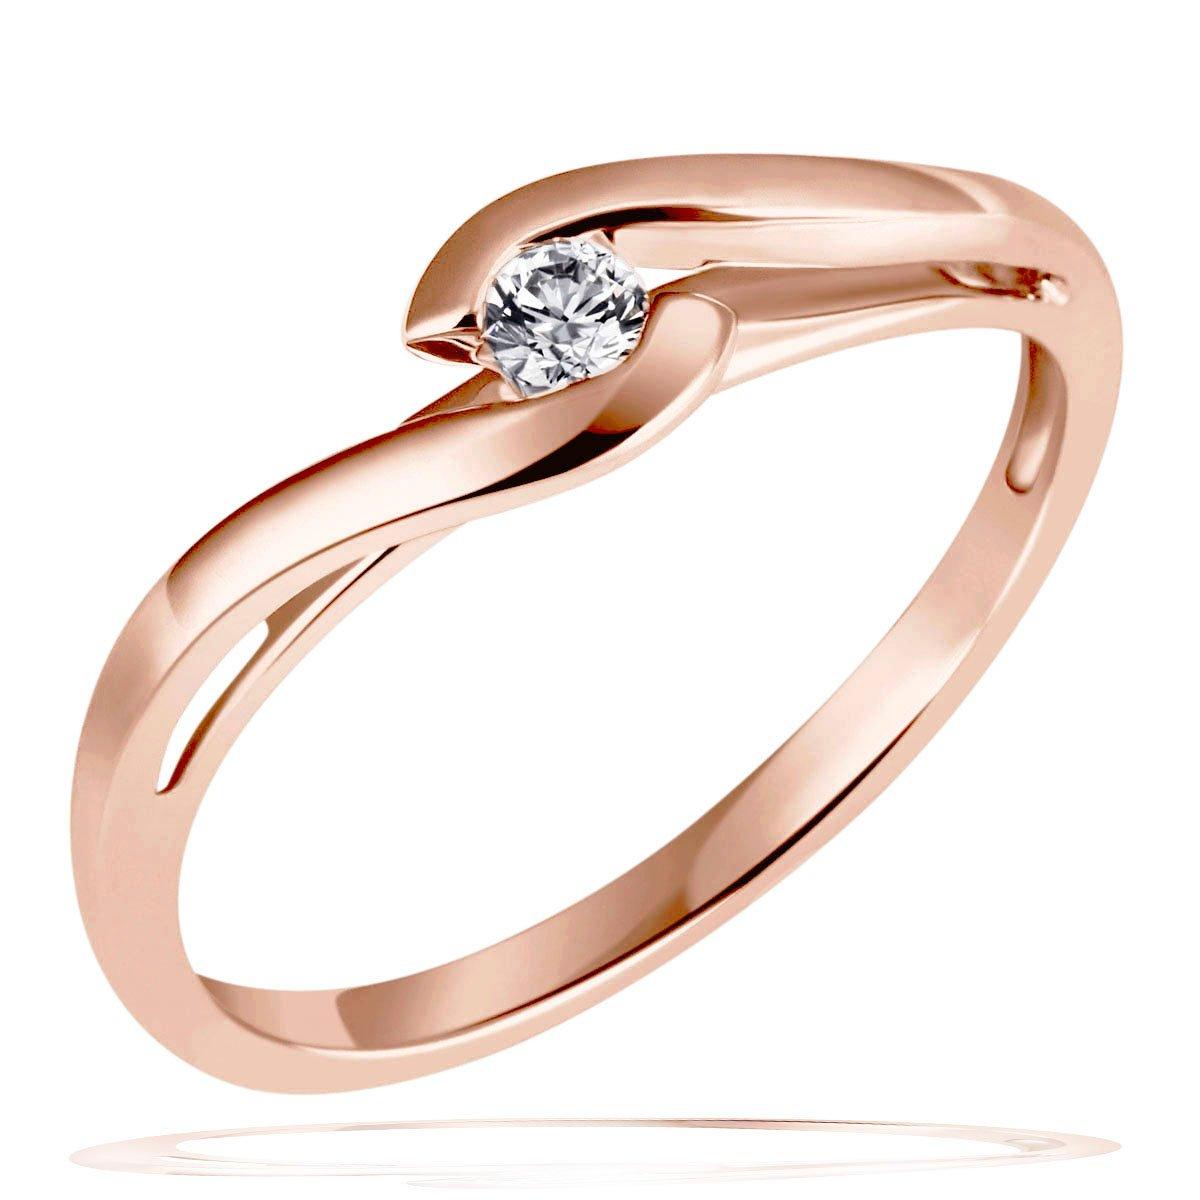 Goldmaid Damen Ring Solitar Verlobungsring 585 Rotgold 1 Brillant 0